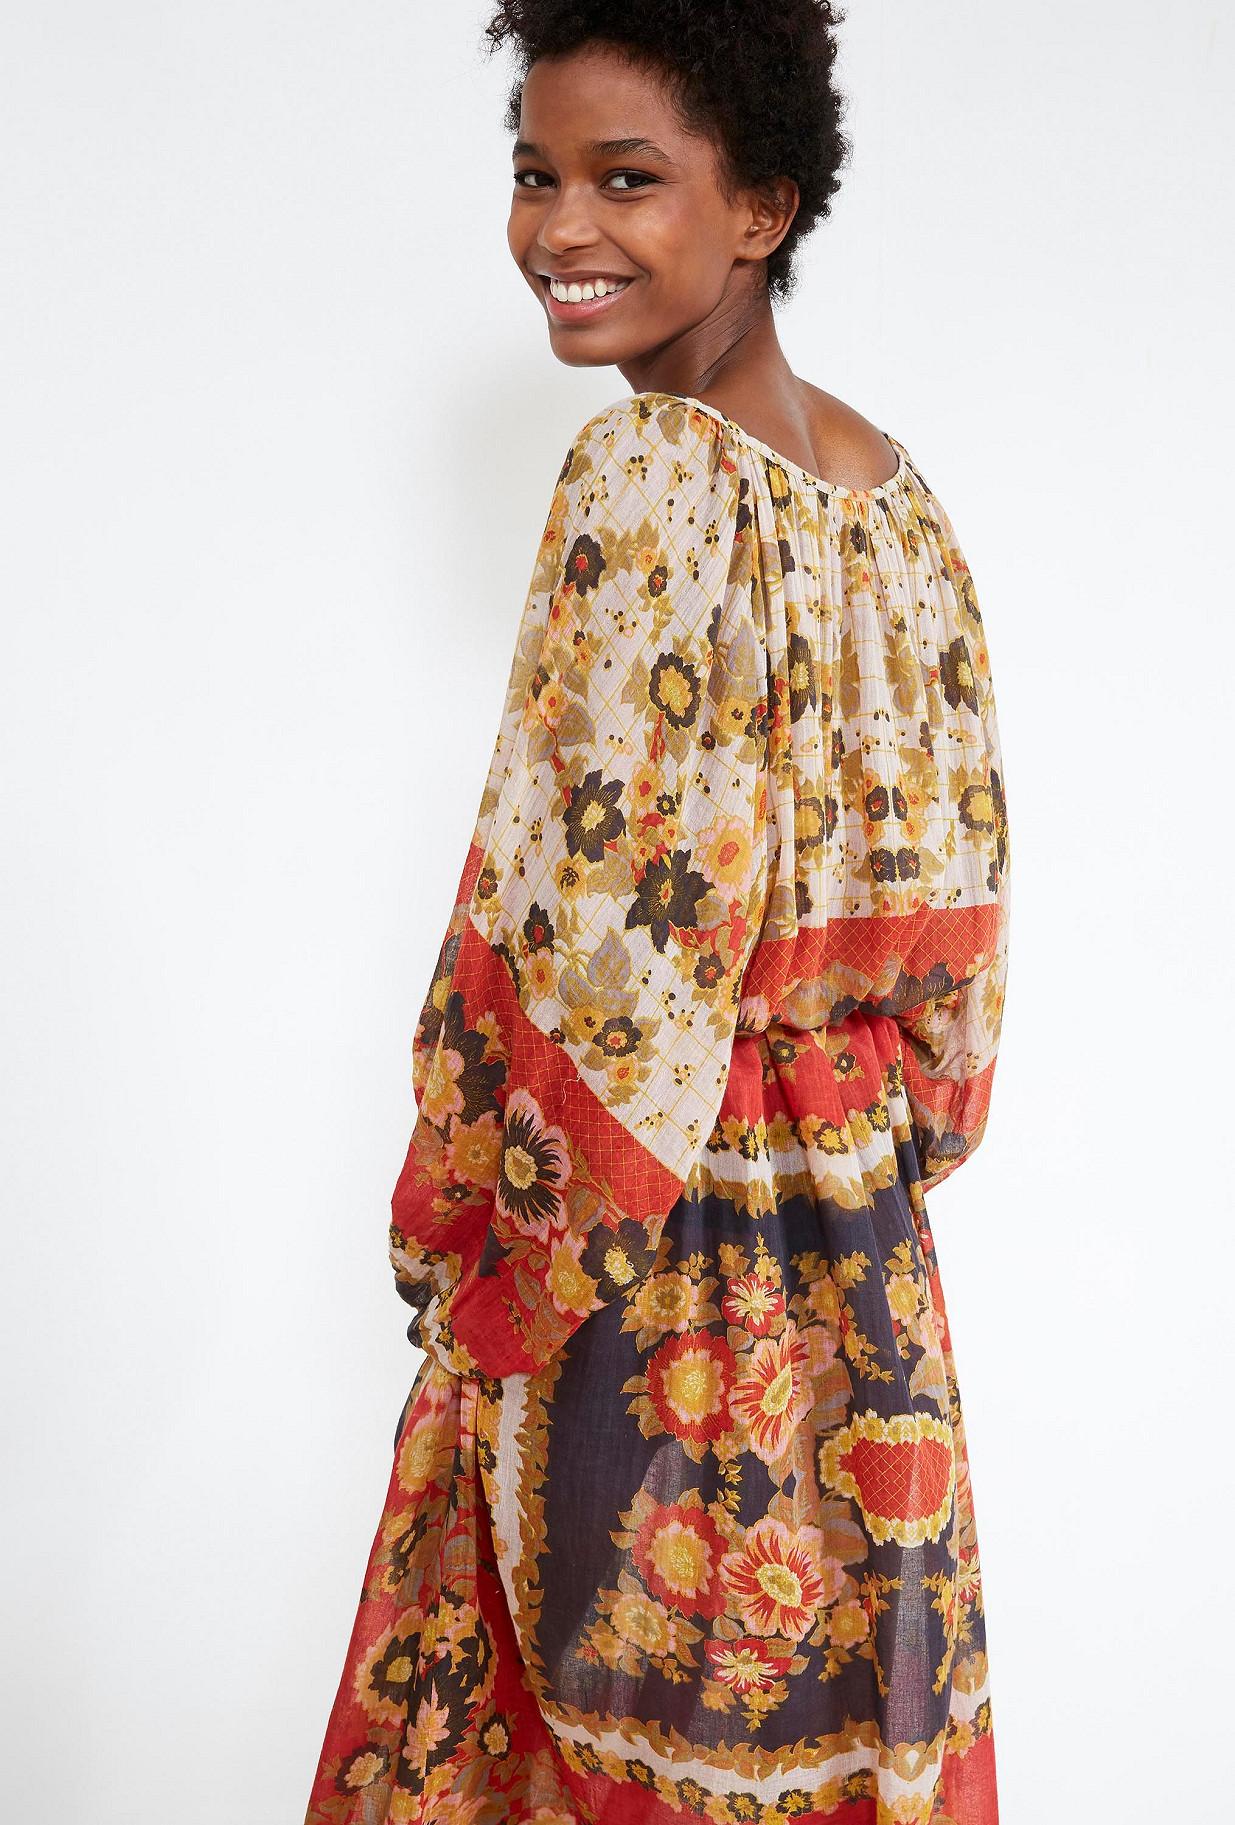 Floral print DRESS Matrioshka Mes Demoiselles Paris